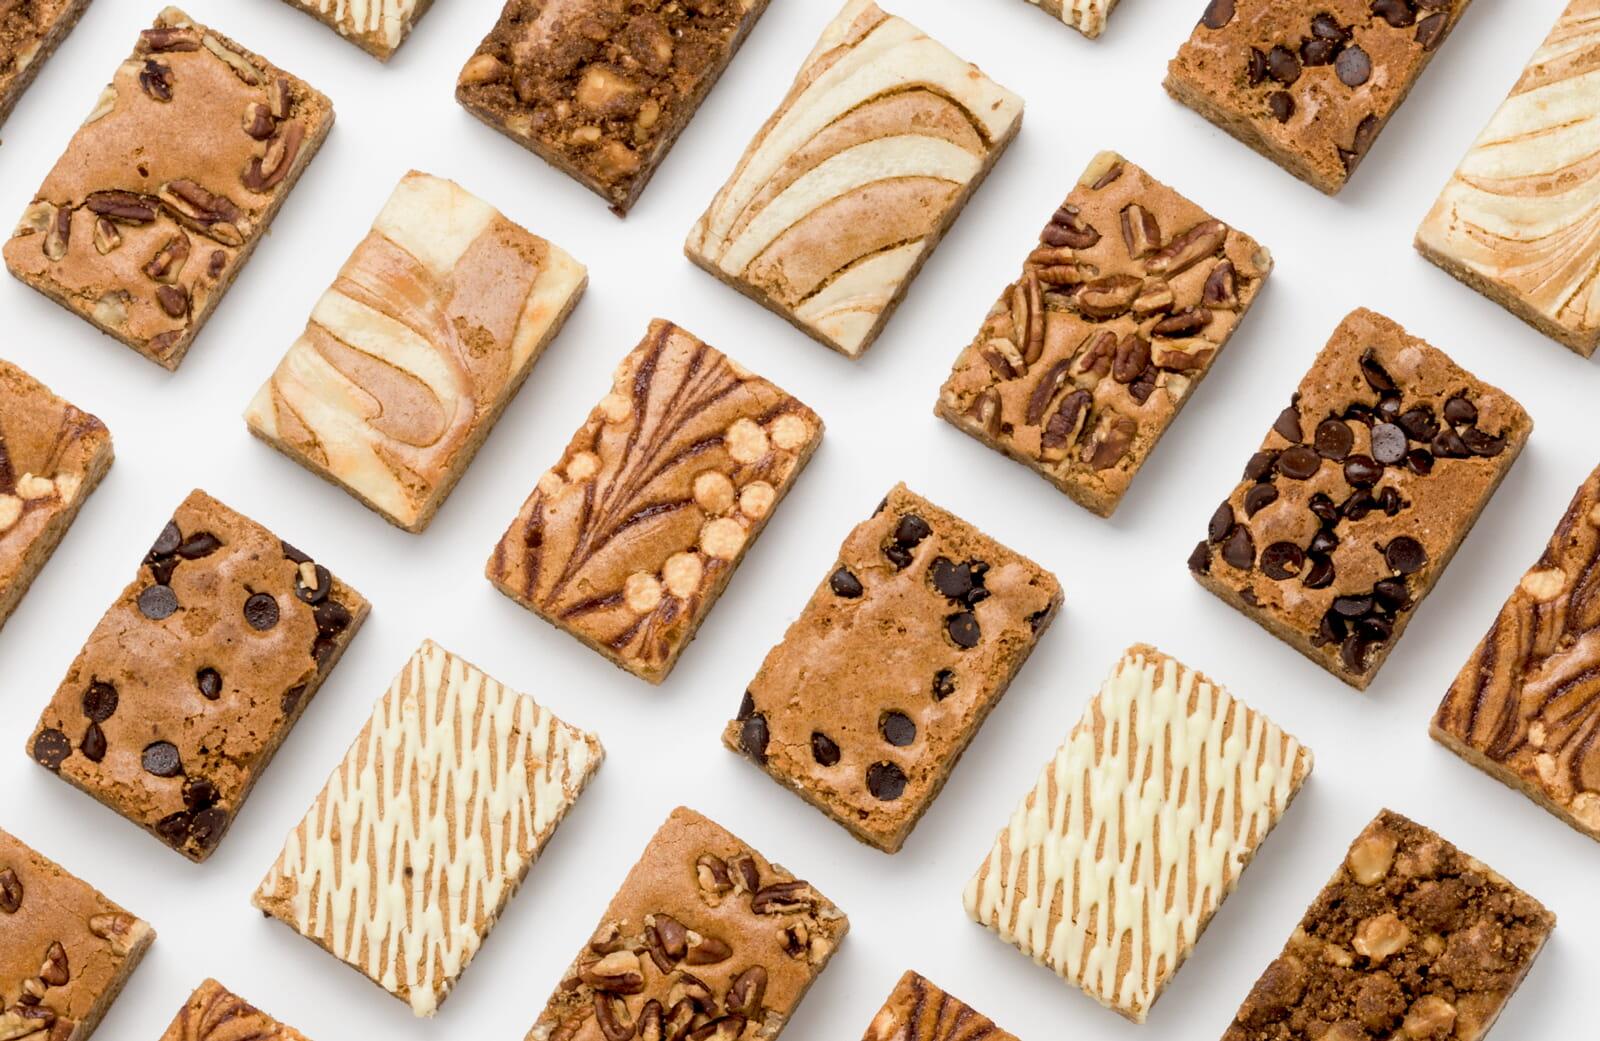 Explore dessert gifts with blondies